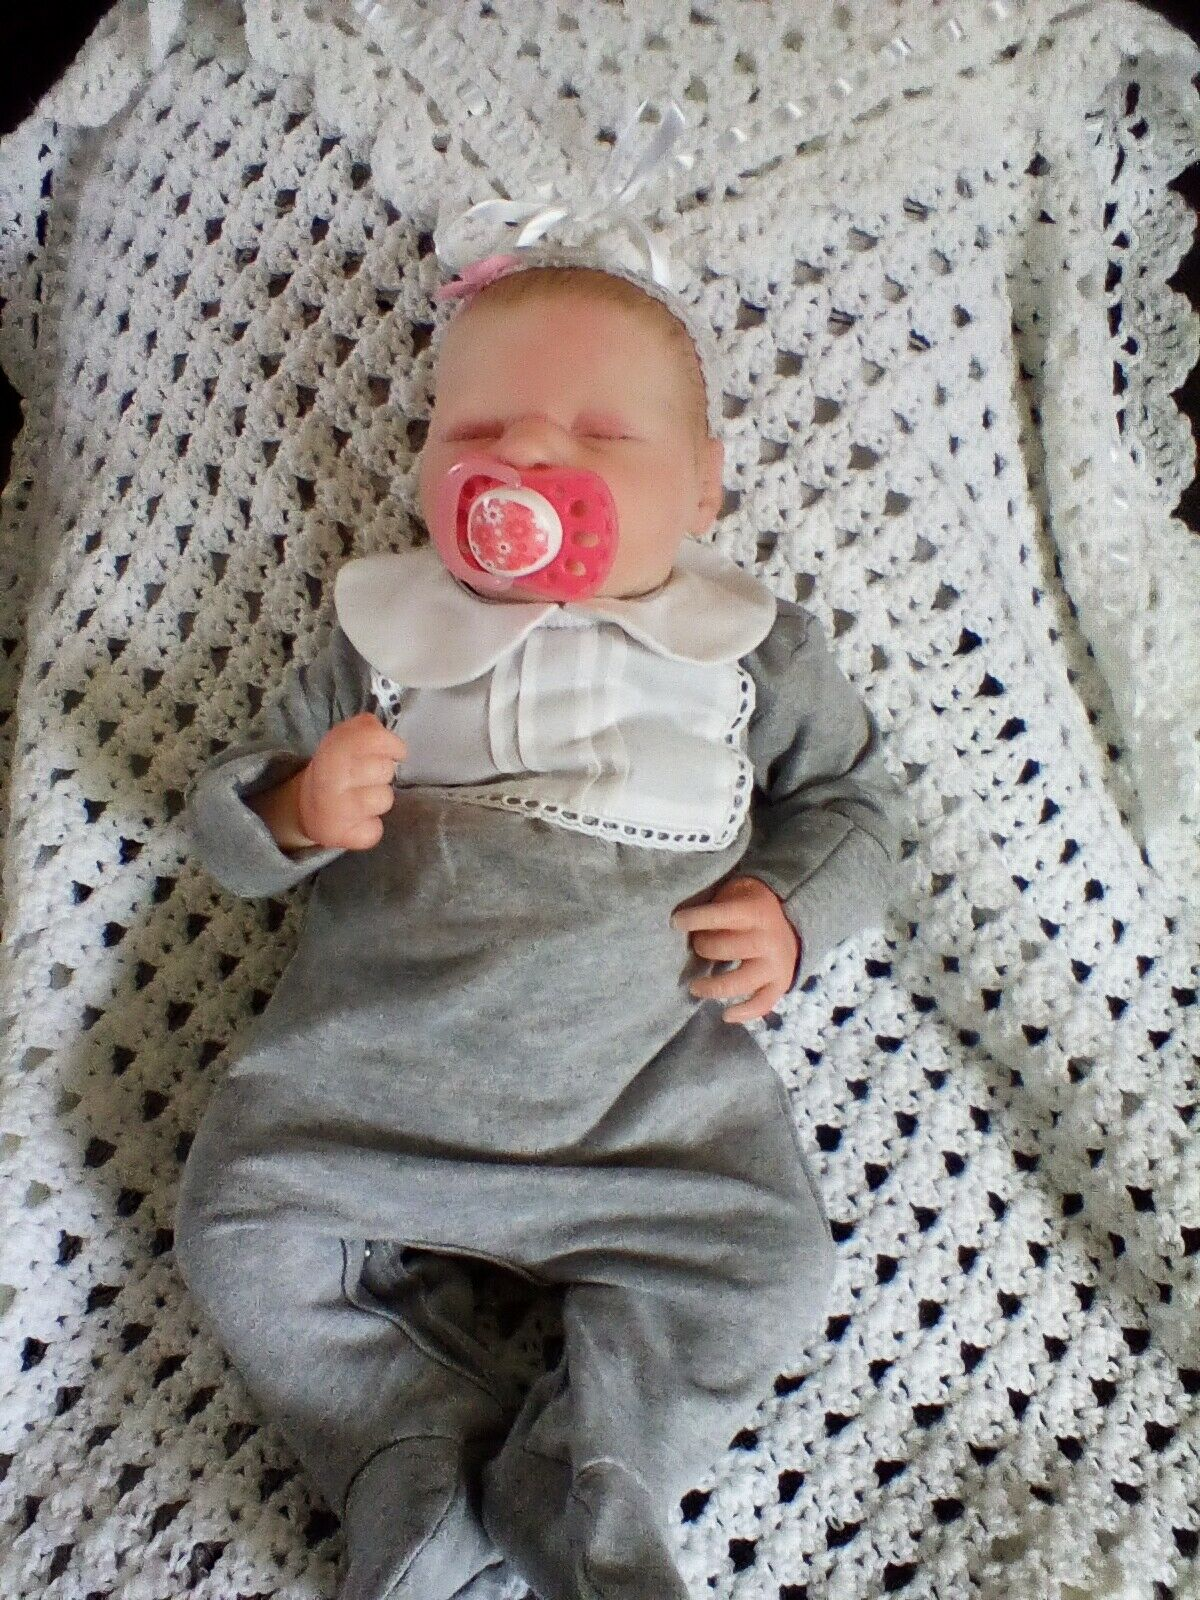 Beautiful reborn baby girl from the sleeping Katie kit by Bountiful Babies